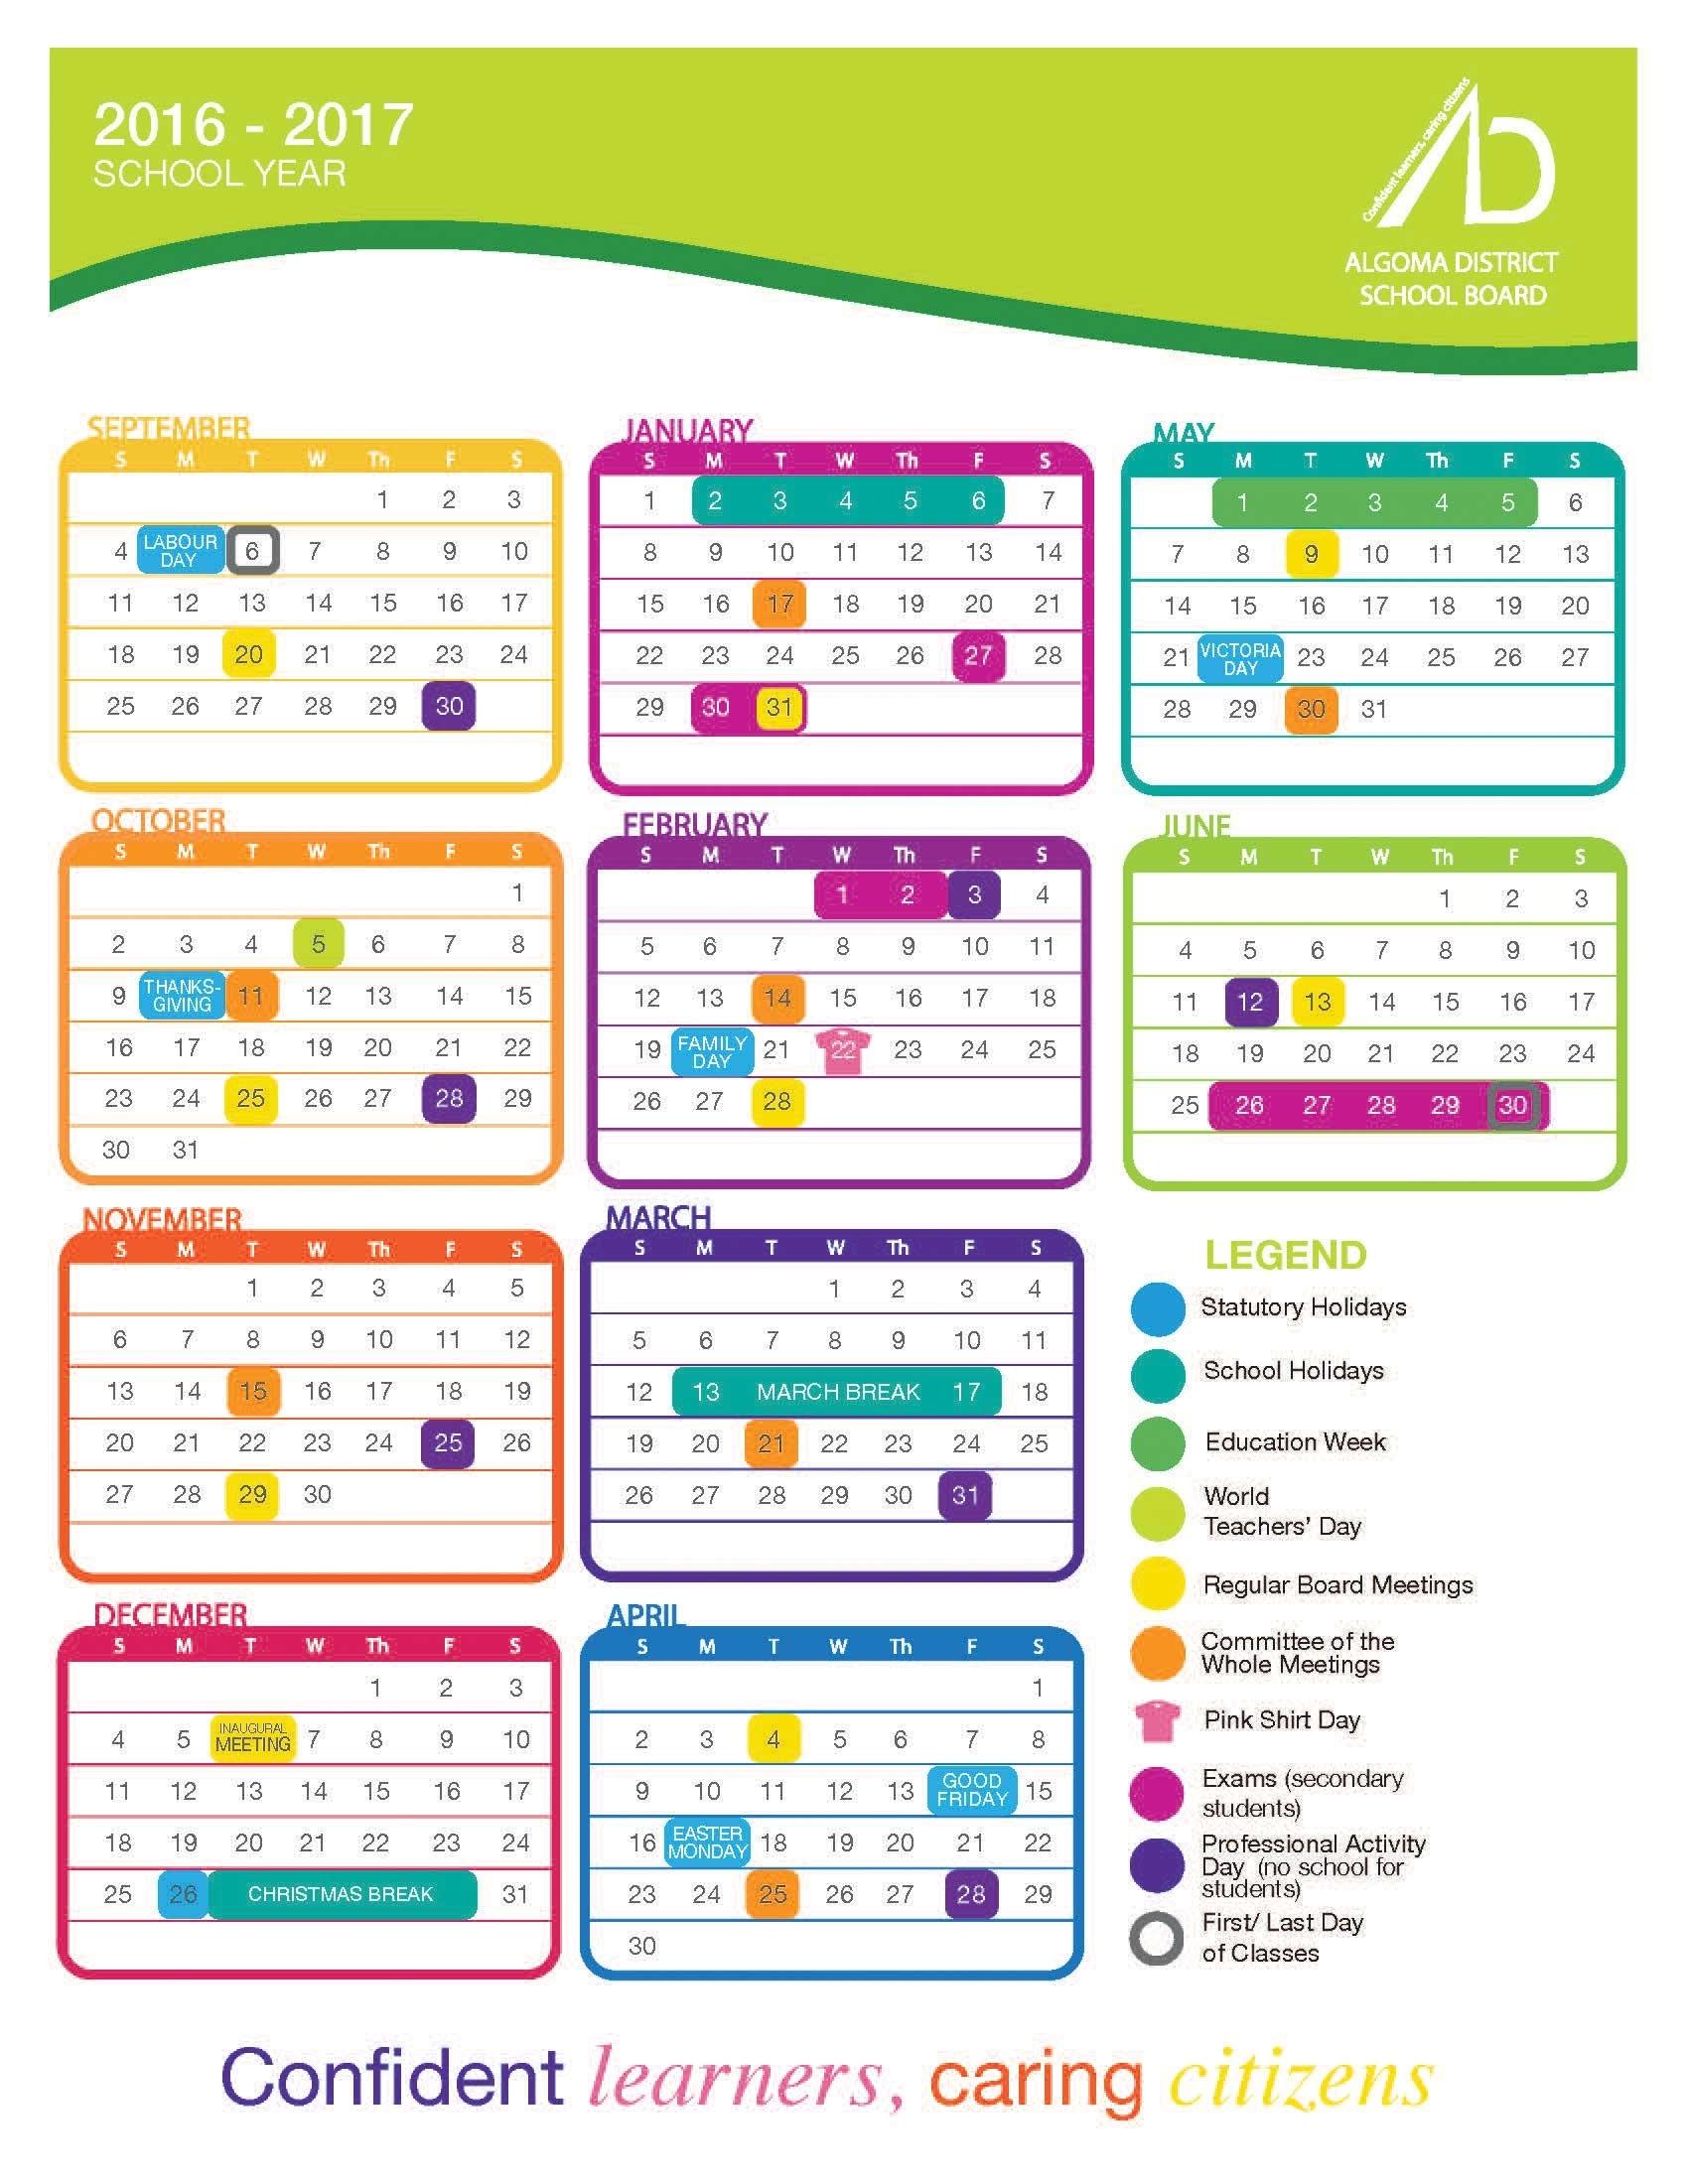 Schoolcalendar - All Documents_Ads B School Calendar